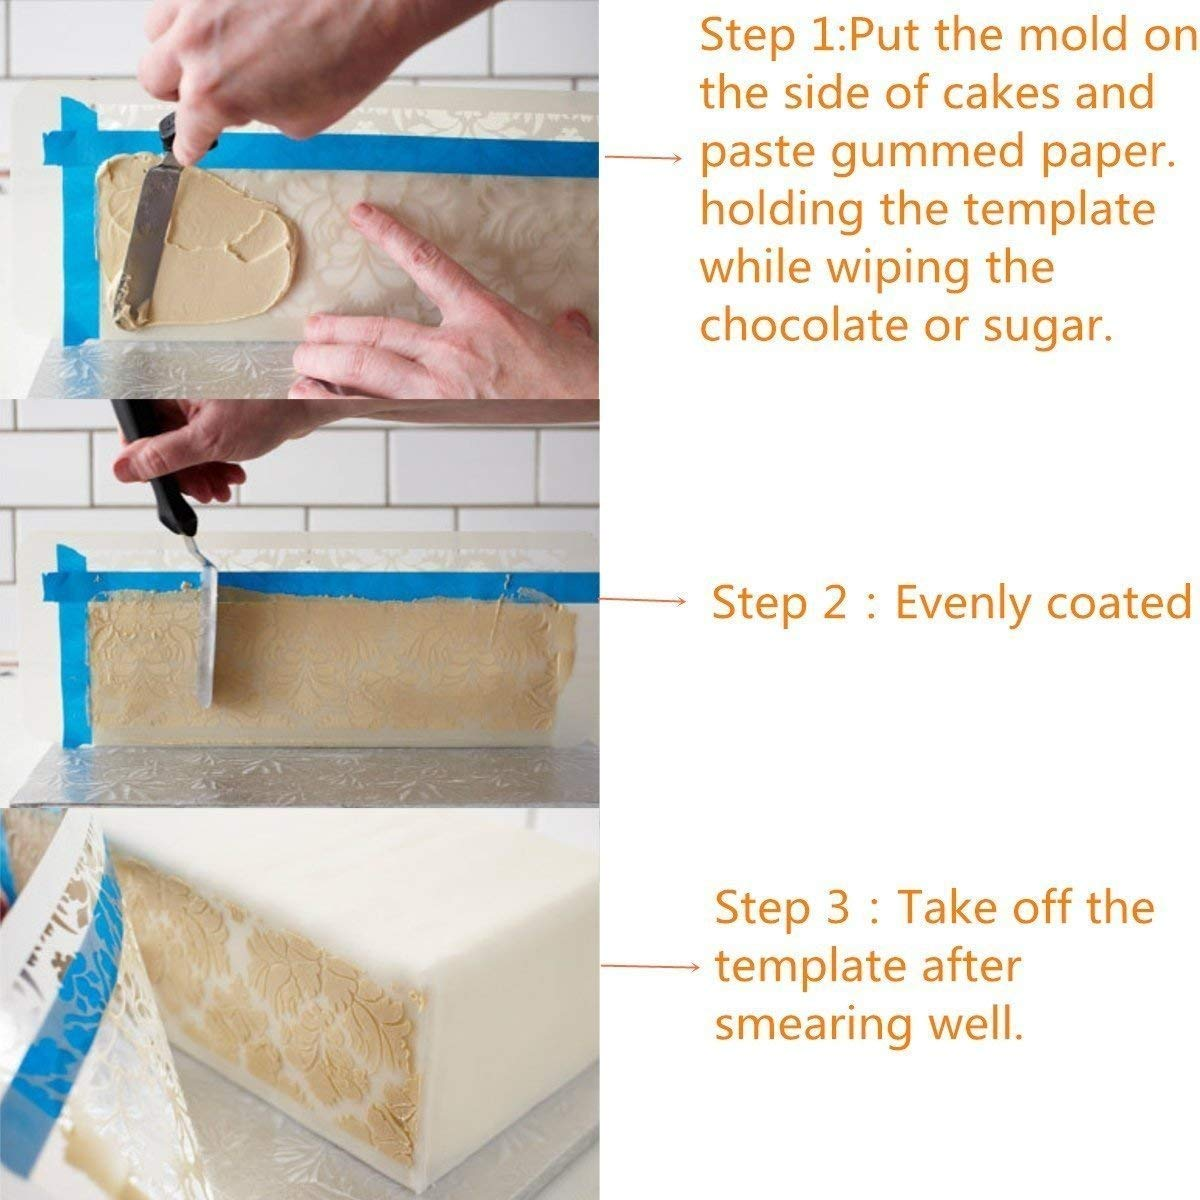 HULISEN 7Pcs Cake Decorating Stencil Mold Wedding Cake Stencil, Cake Mould by HULISEN (Image #3)